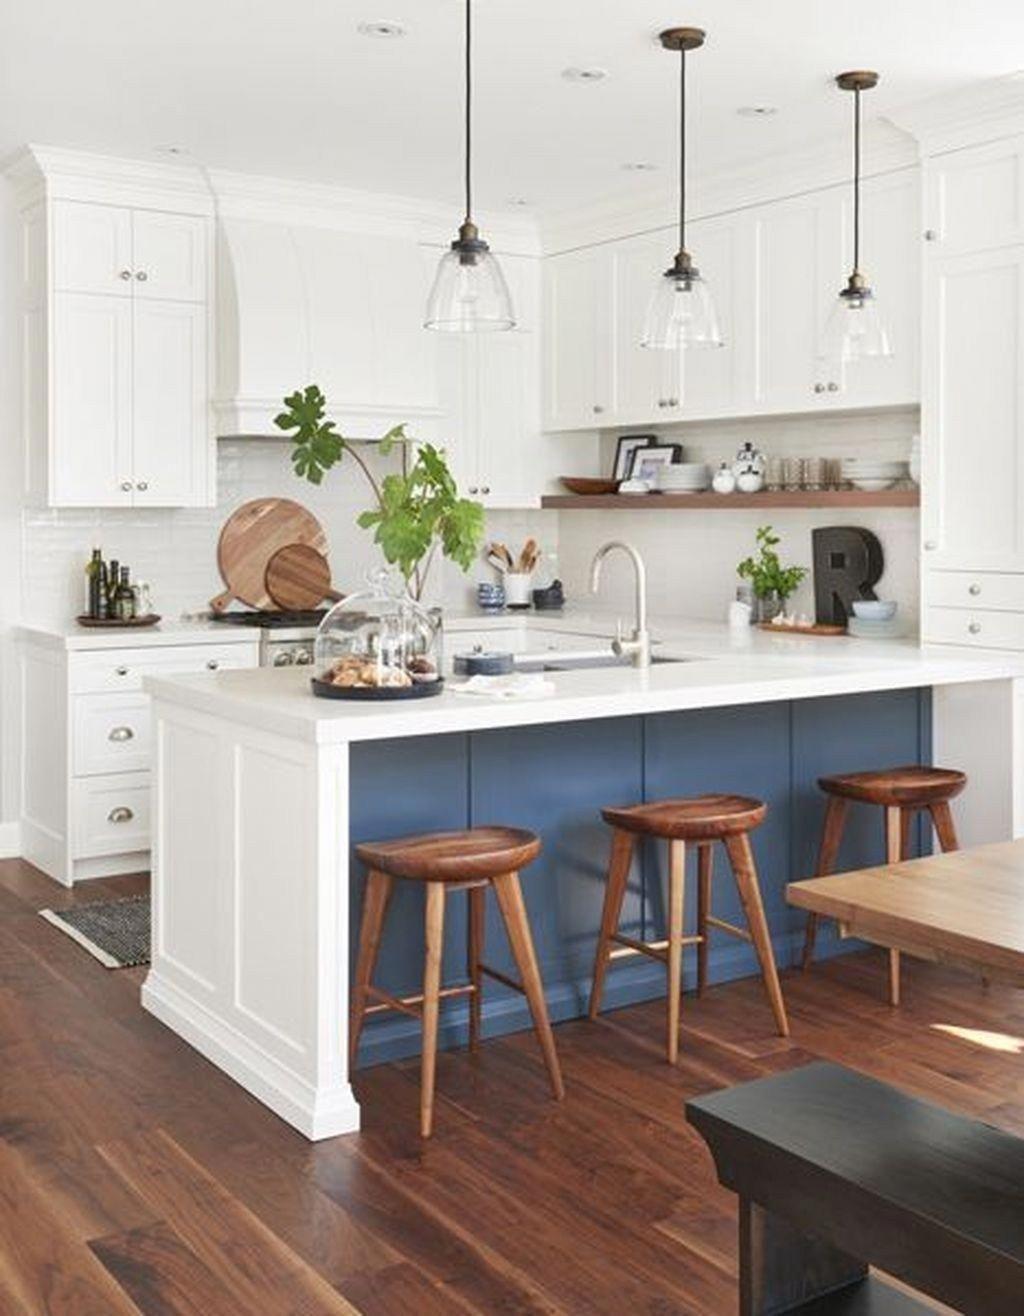 Adorable 38 Relaxing Kitchen Designs Ideas Kitchendecor Diy Kitchen Renovation Kitchen Design Small Kitchen Remodel